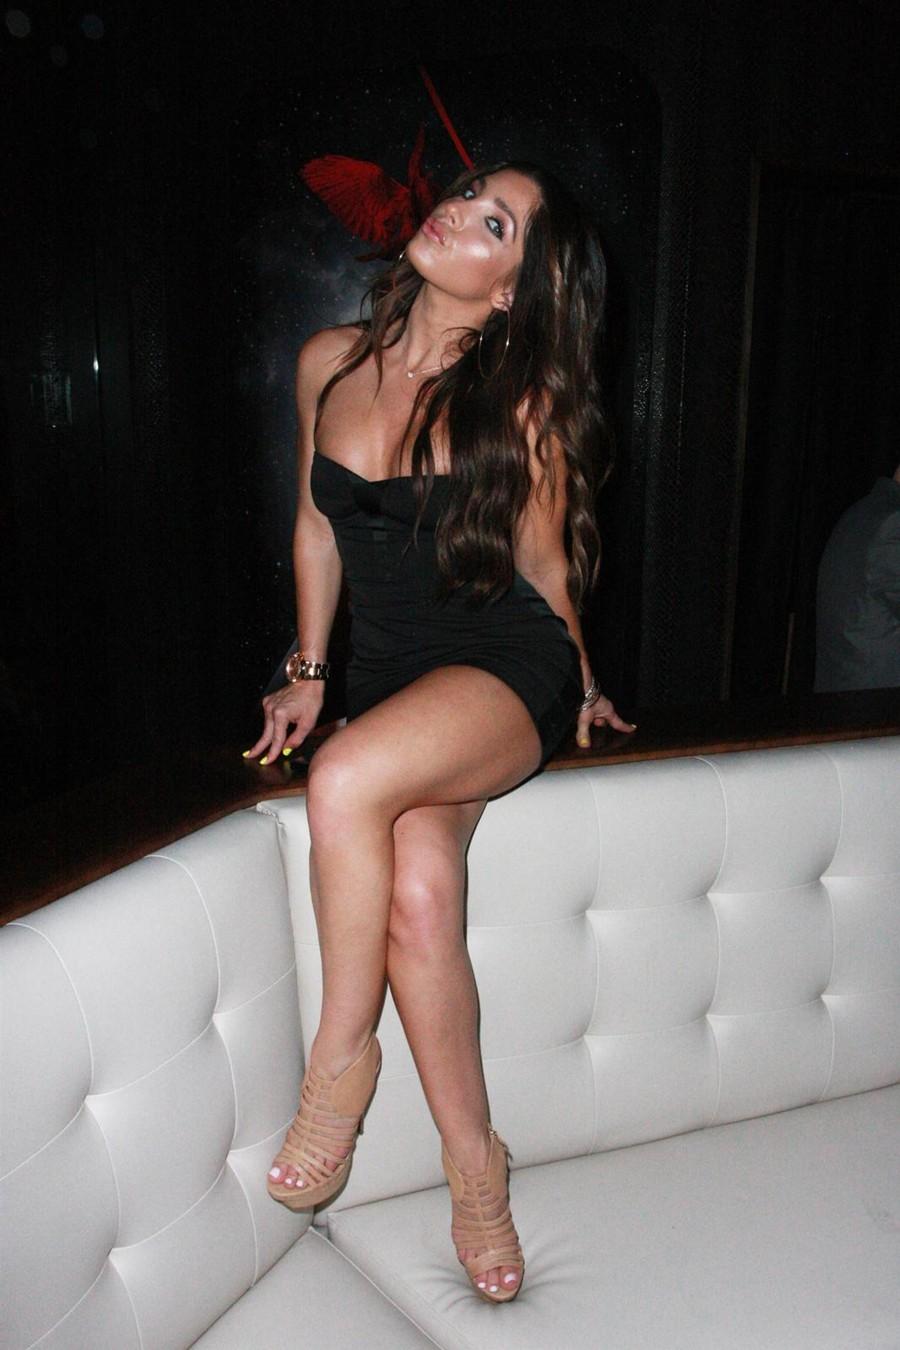 Feet Melissa Molinaro nude (34 photos), Ass, Bikini, Boobs, legs 2018